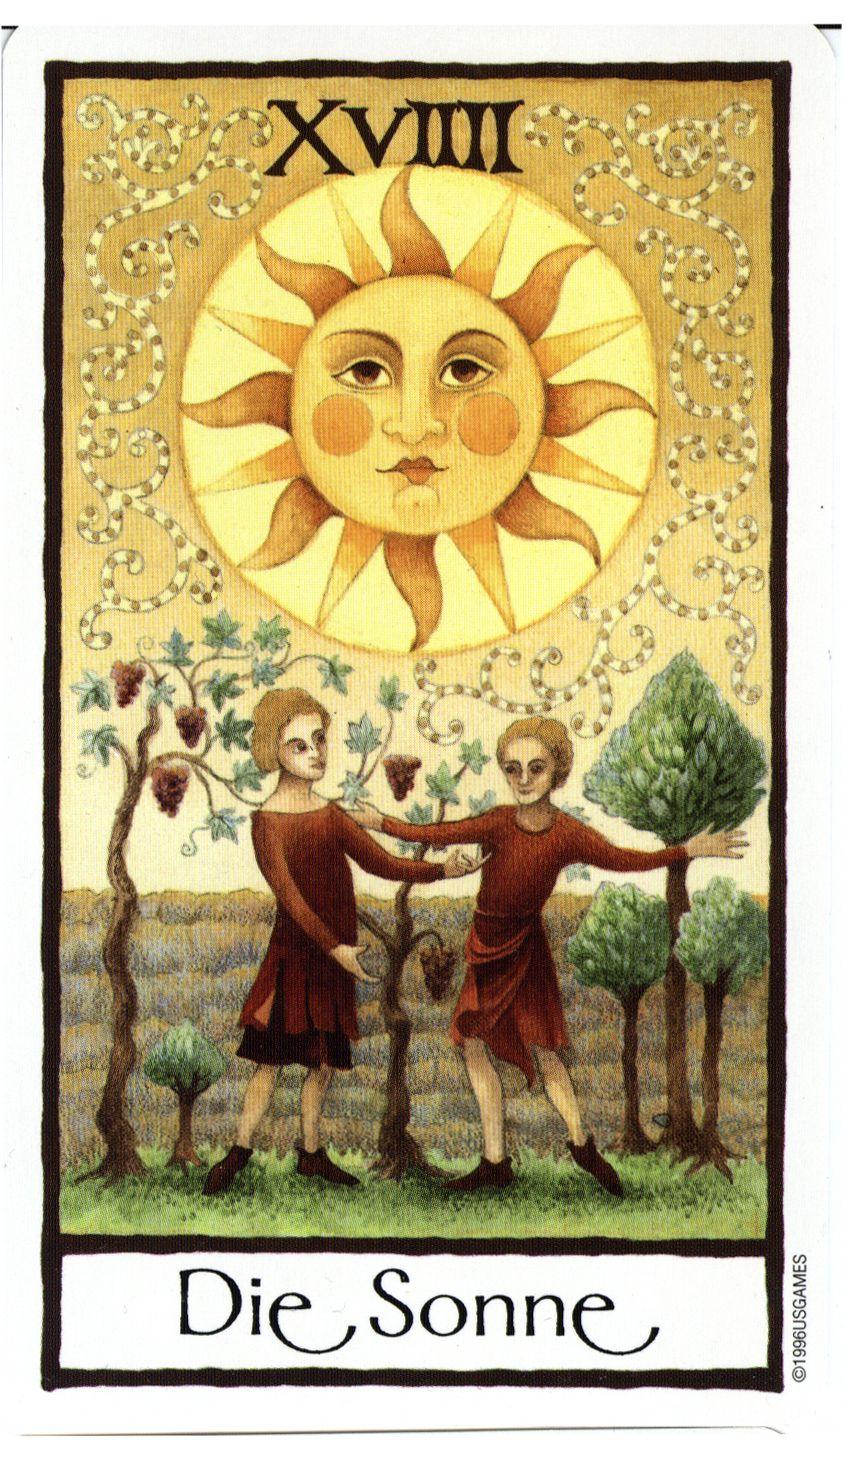 The Sun - Old English Tarot (Die Sonne) | All Things Tarot | The sun